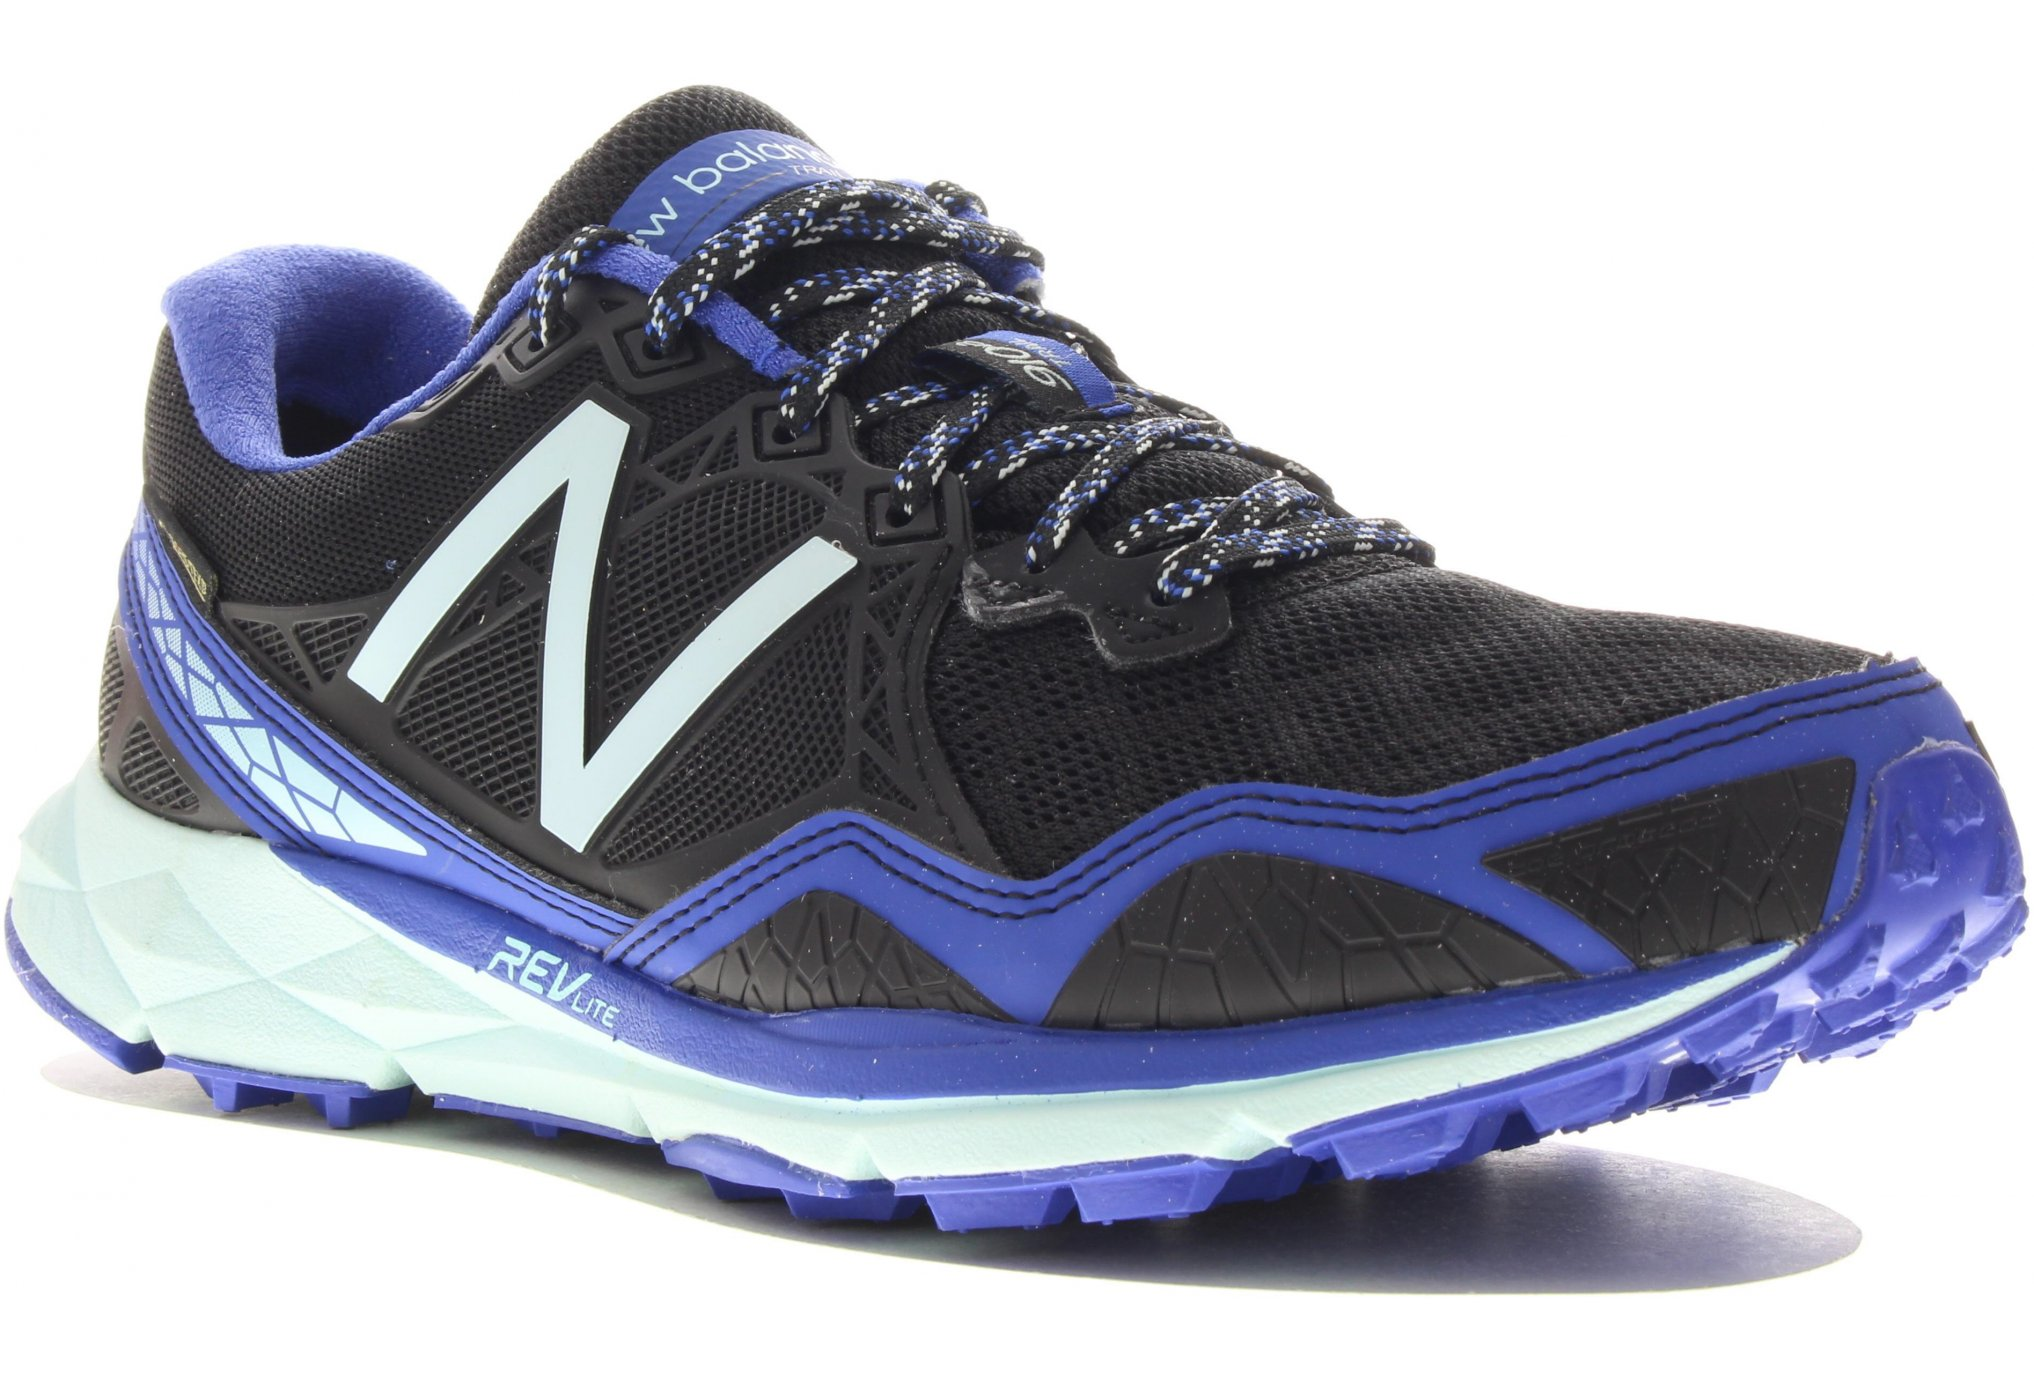 New Balance WT 910 v3 - B Diététique Chaussures femme